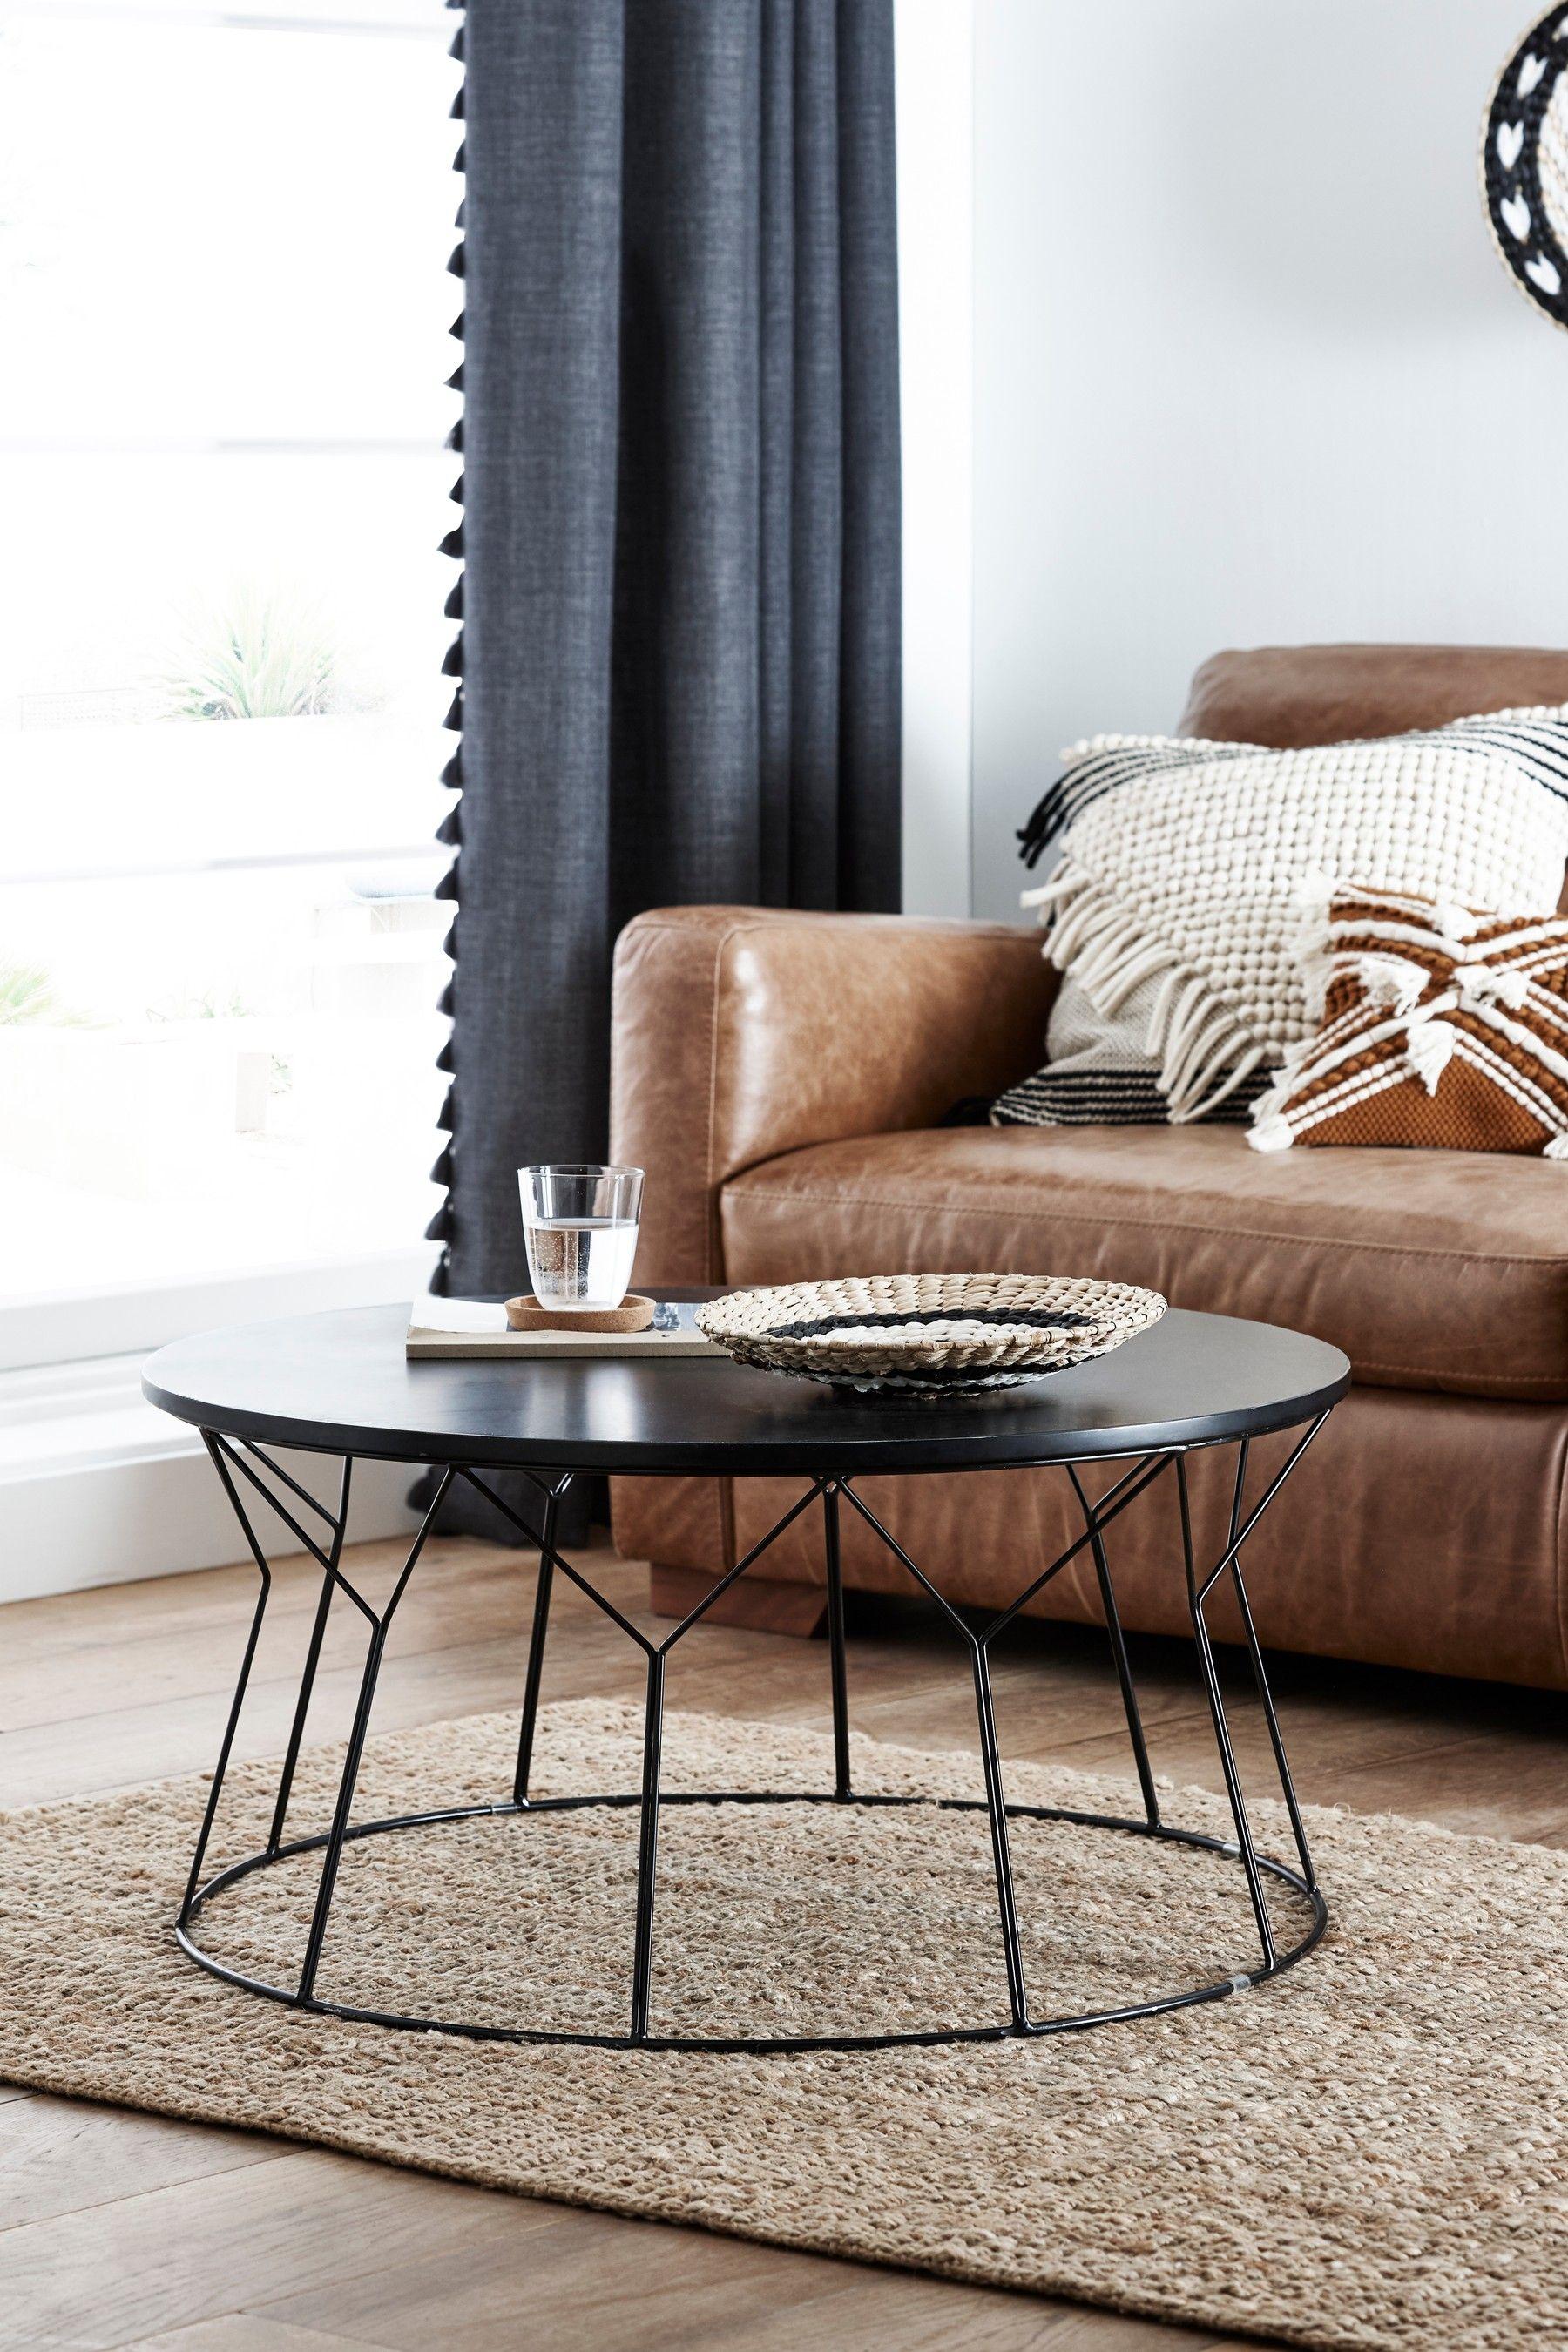 Next Modine Black Coffee Table Black Coffee Table Black Glass Coffee Table Round Metal Coffee Table [ 2700 x 1800 Pixel ]